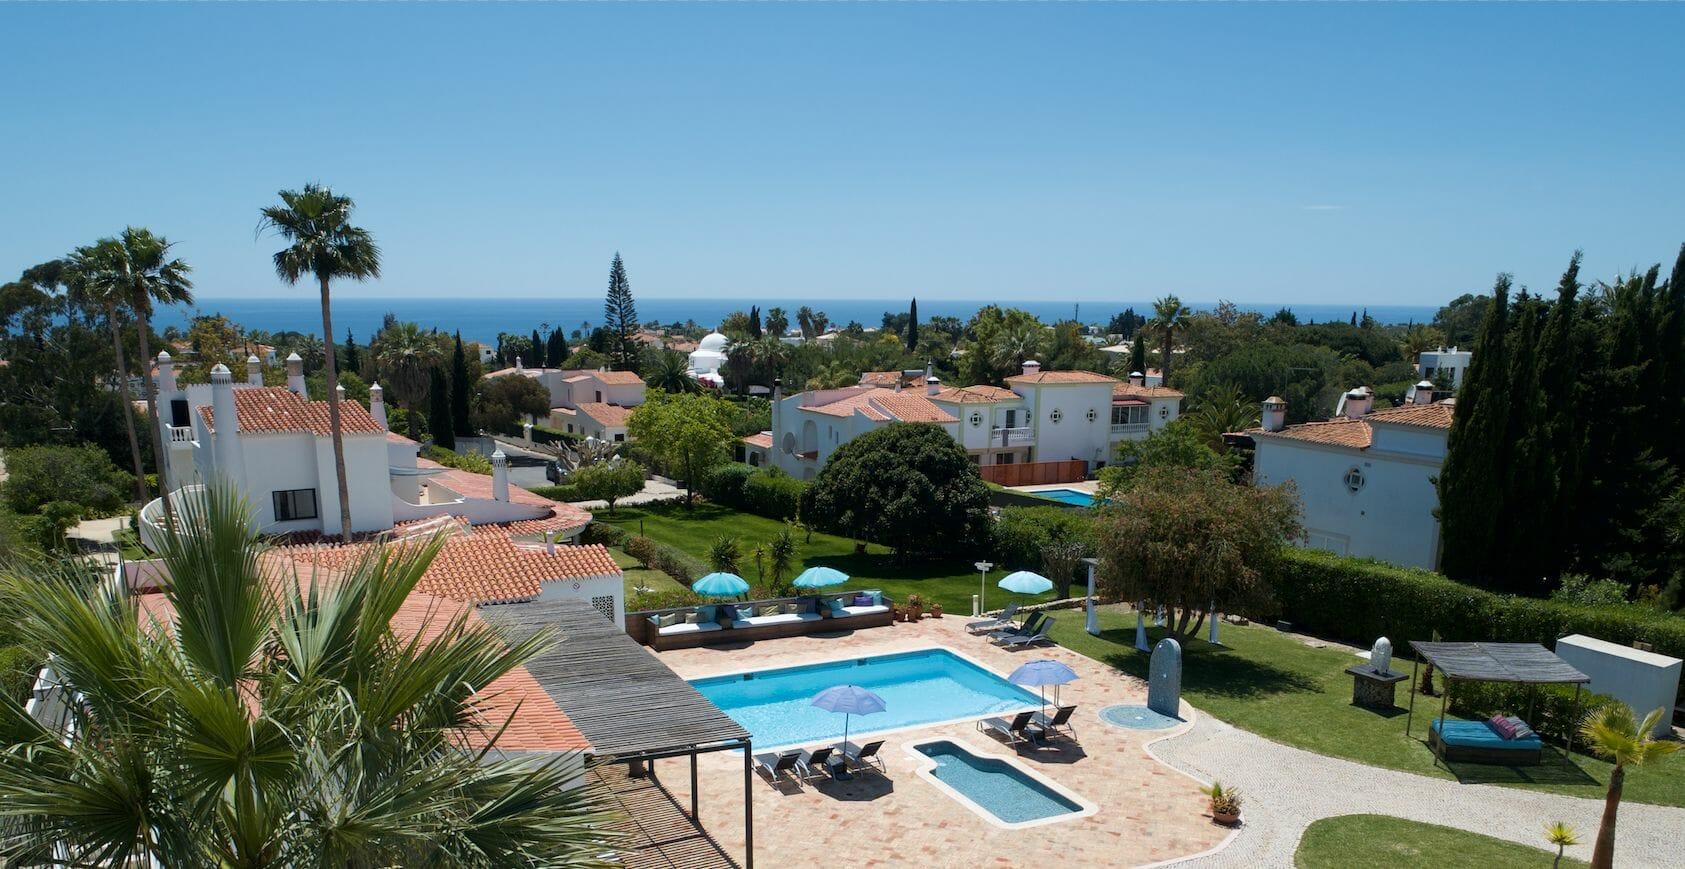 Retreat Resort Algarve Blick über Pool aufs Meer